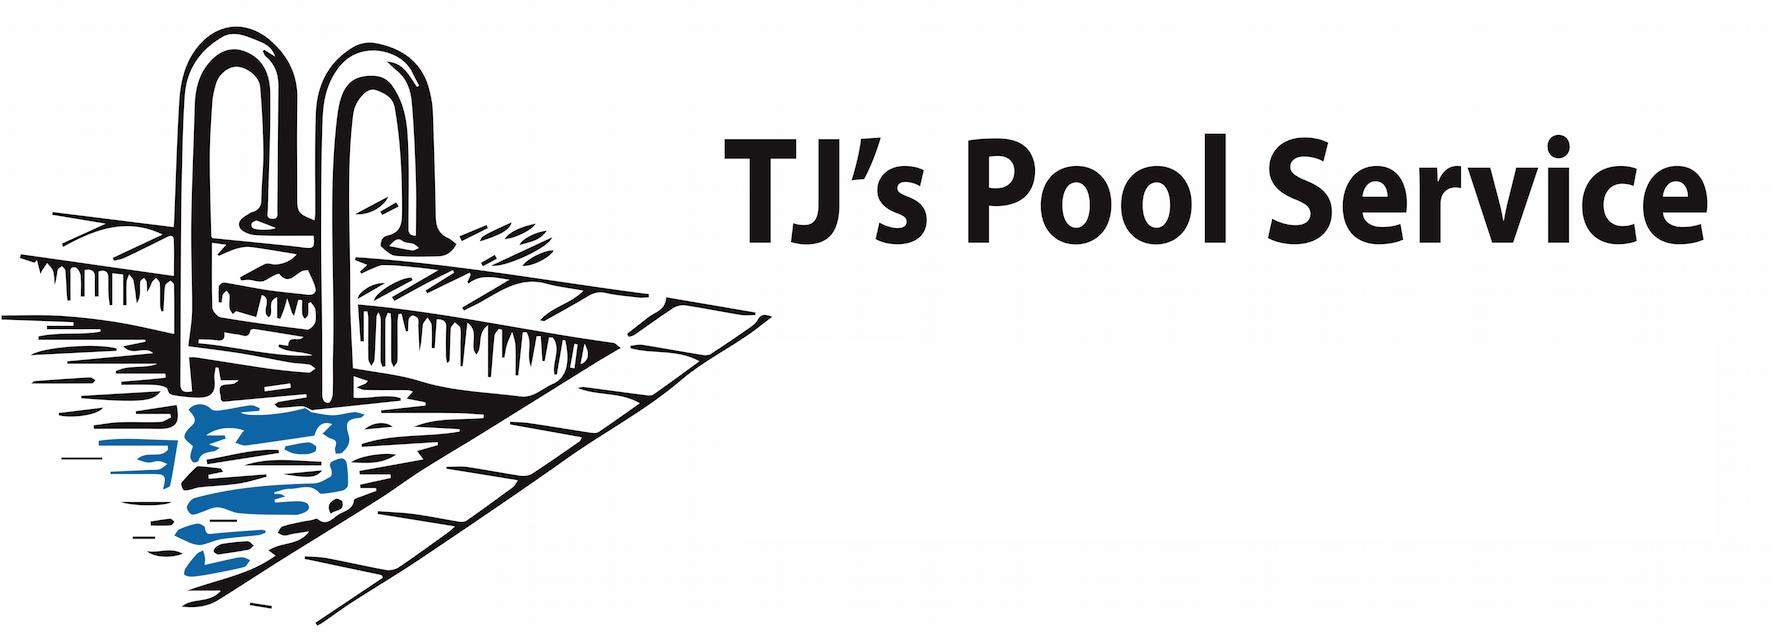 TJs Pool Service